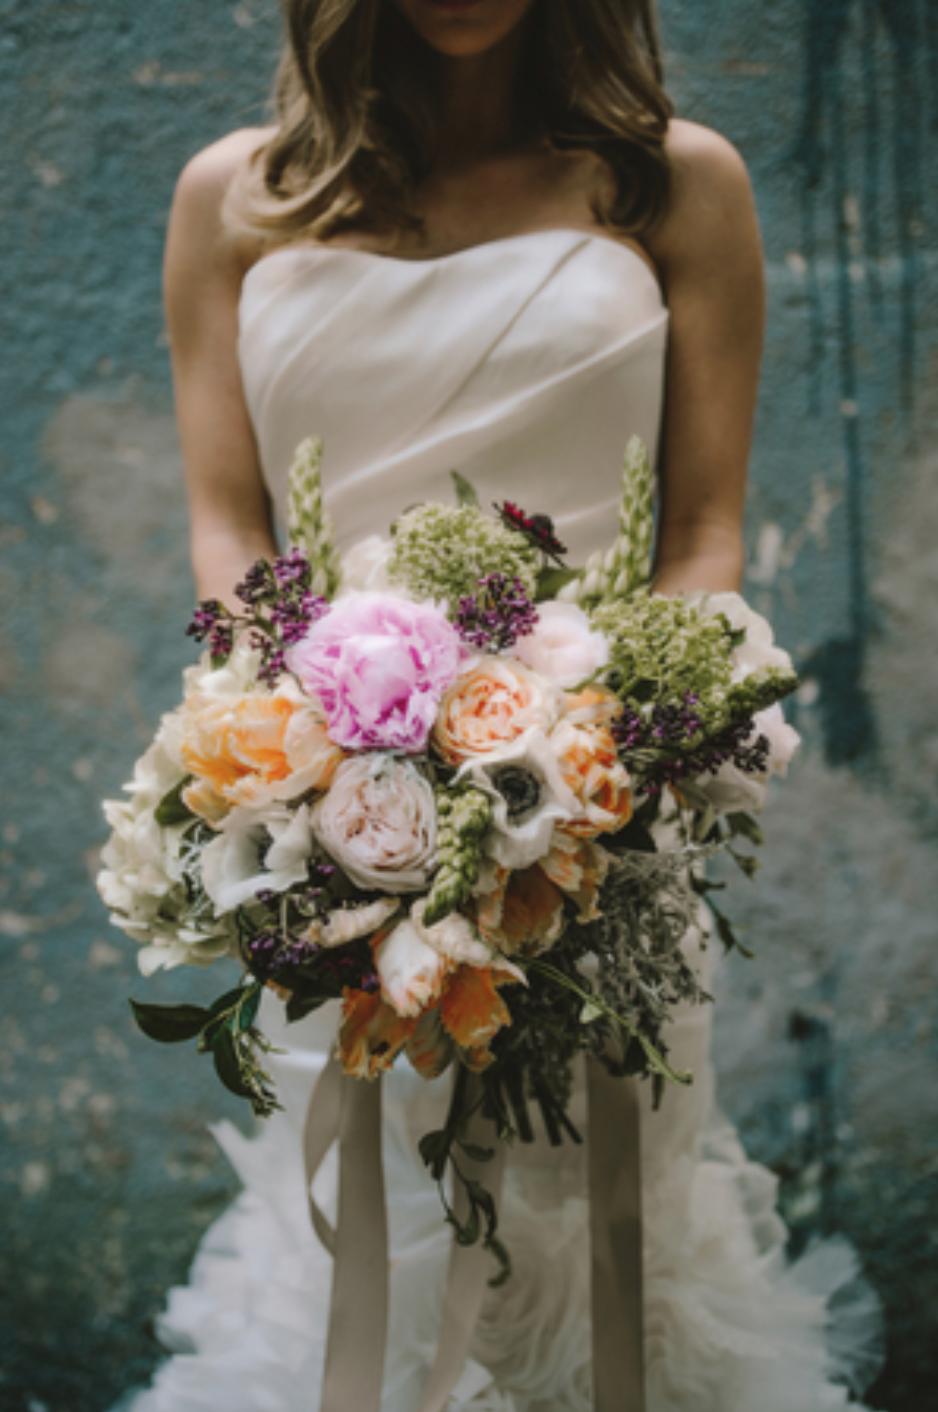 Big blushing flower bouquet with orange, pink & anemones. By Maxit Flower Design in Houston, TX.